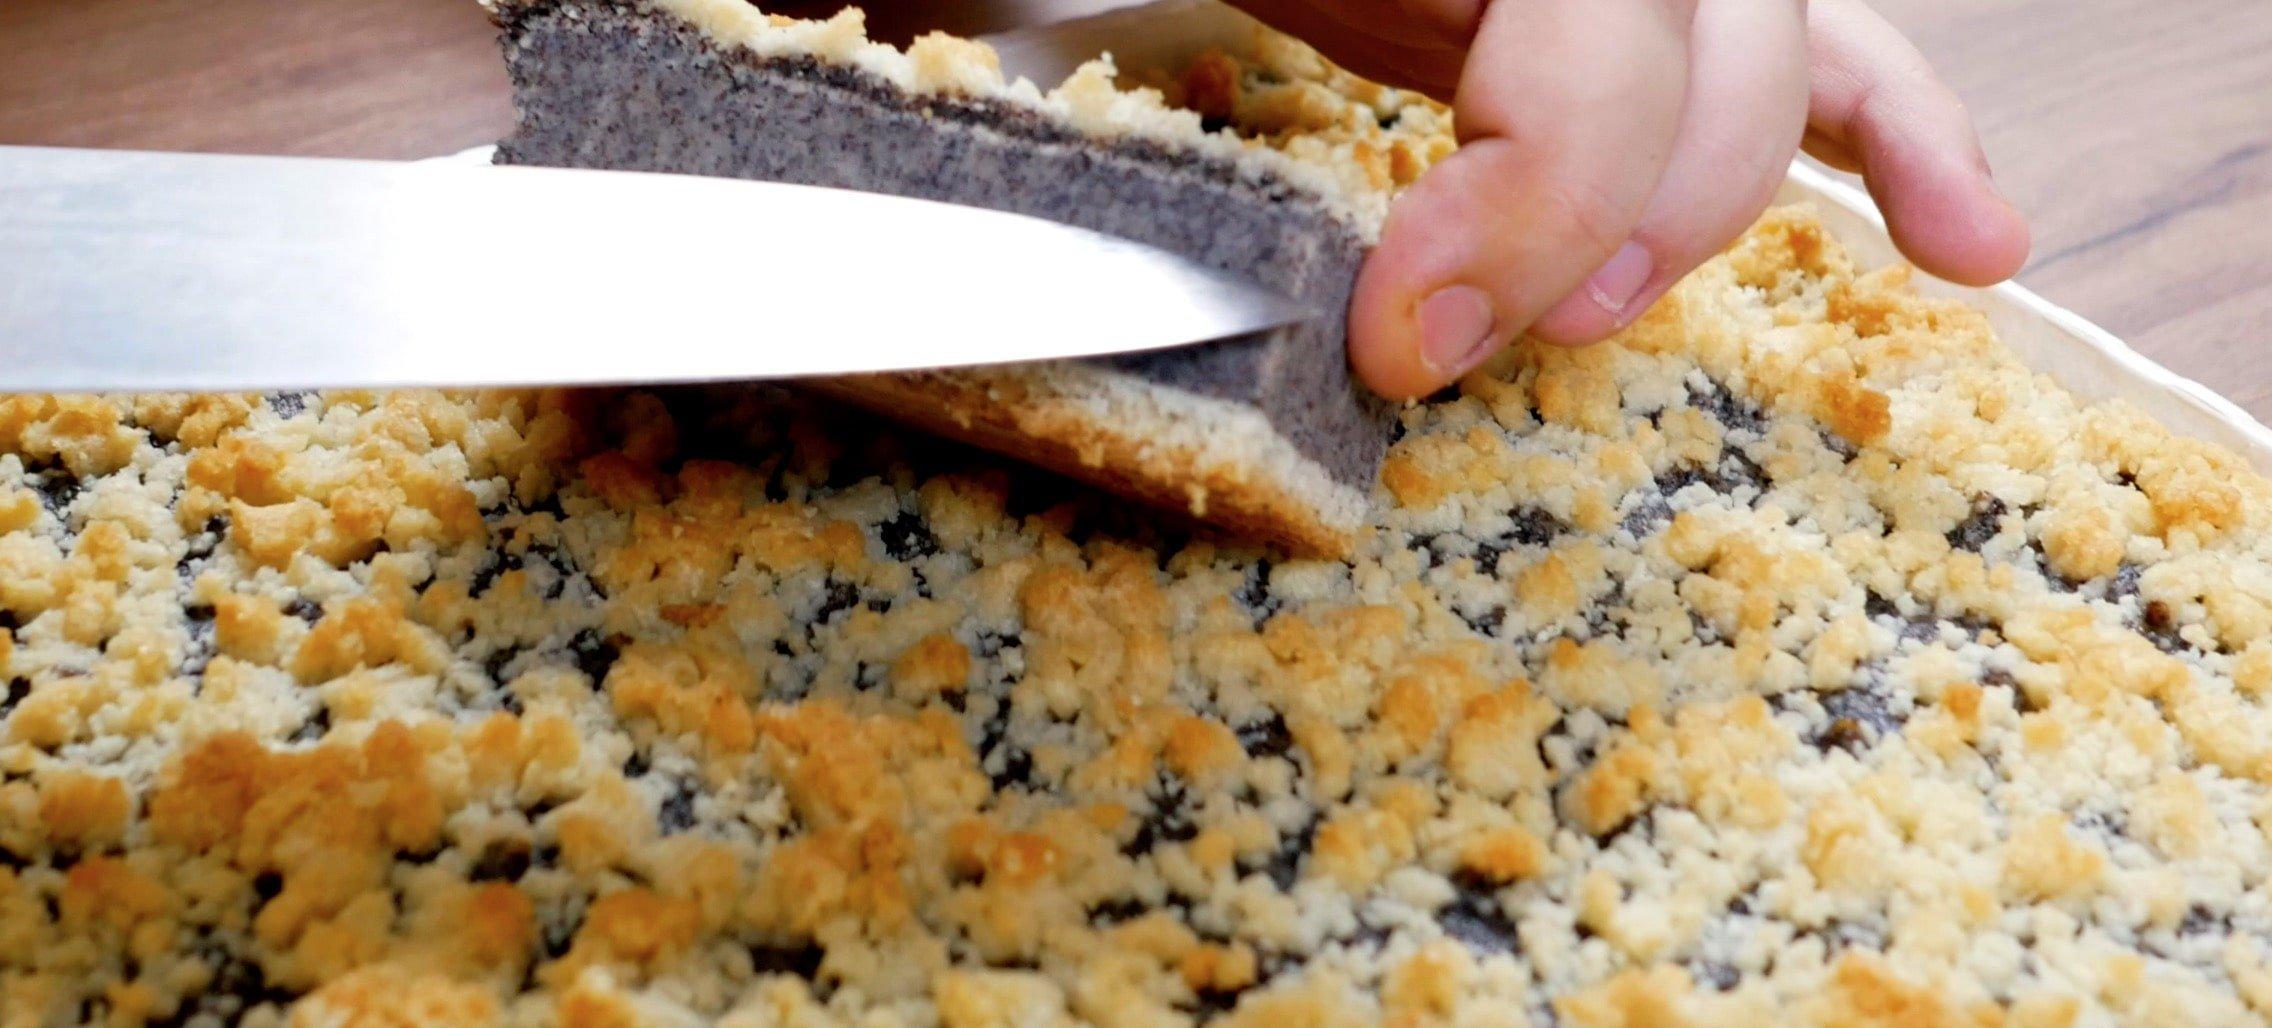 Cheese-сake.ru маковый пирог внутри